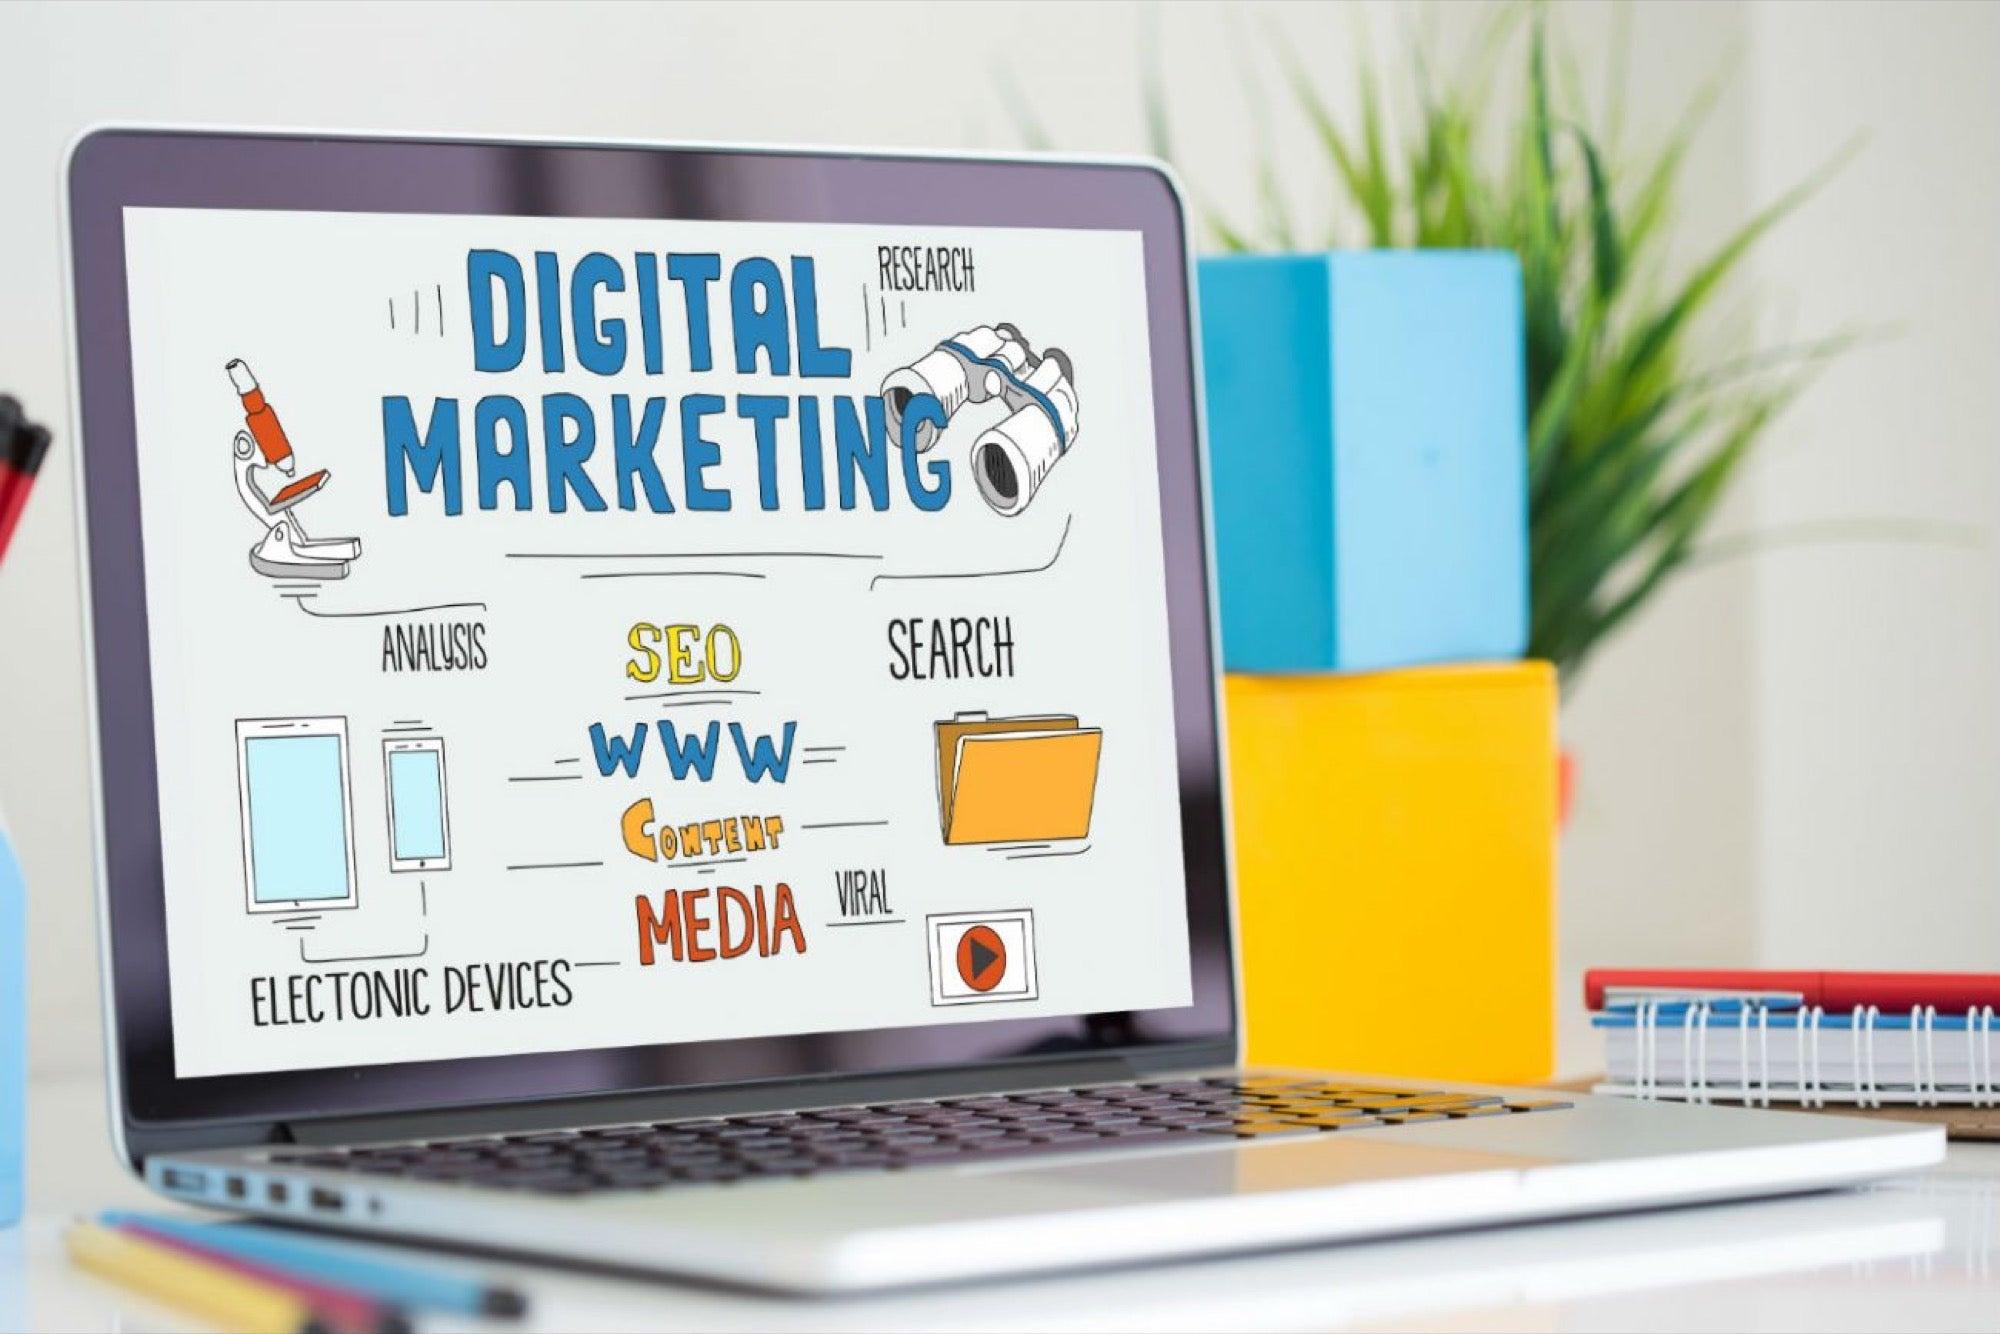 Cursos online gratuitos de marketing digital